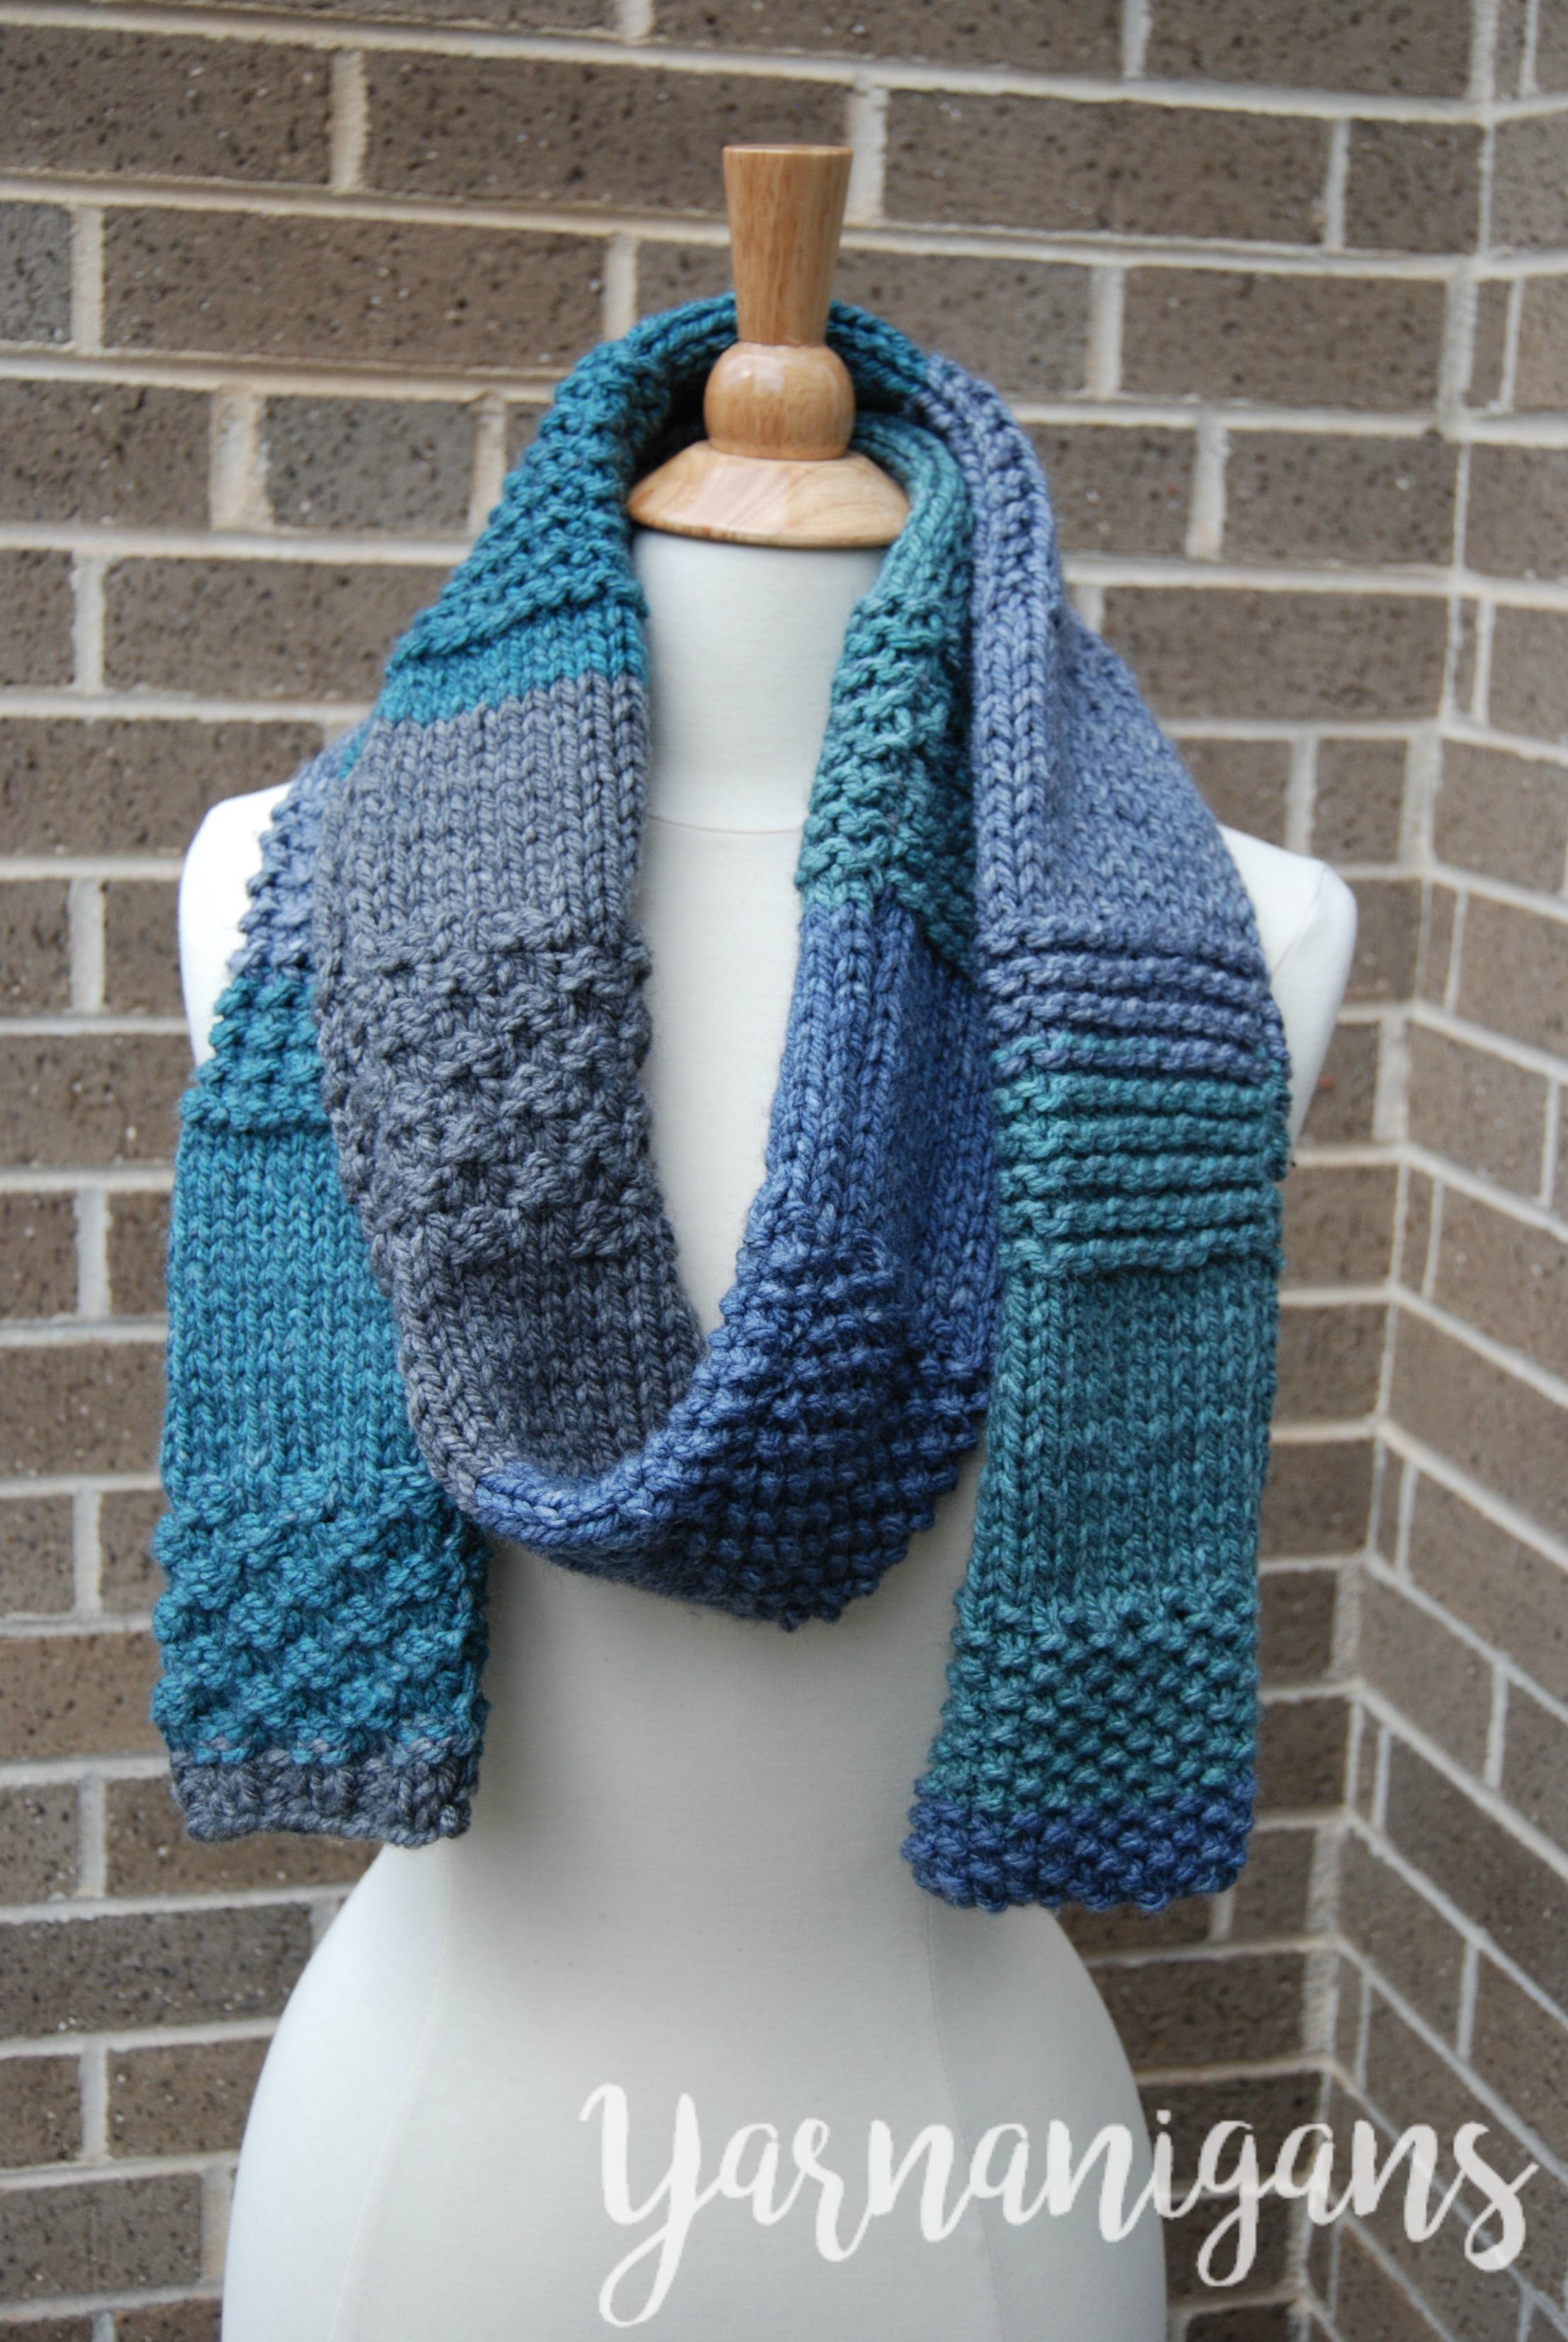 61e26935d Knit Sampler Scarf - Free Knit Pattern - Yarnanigans